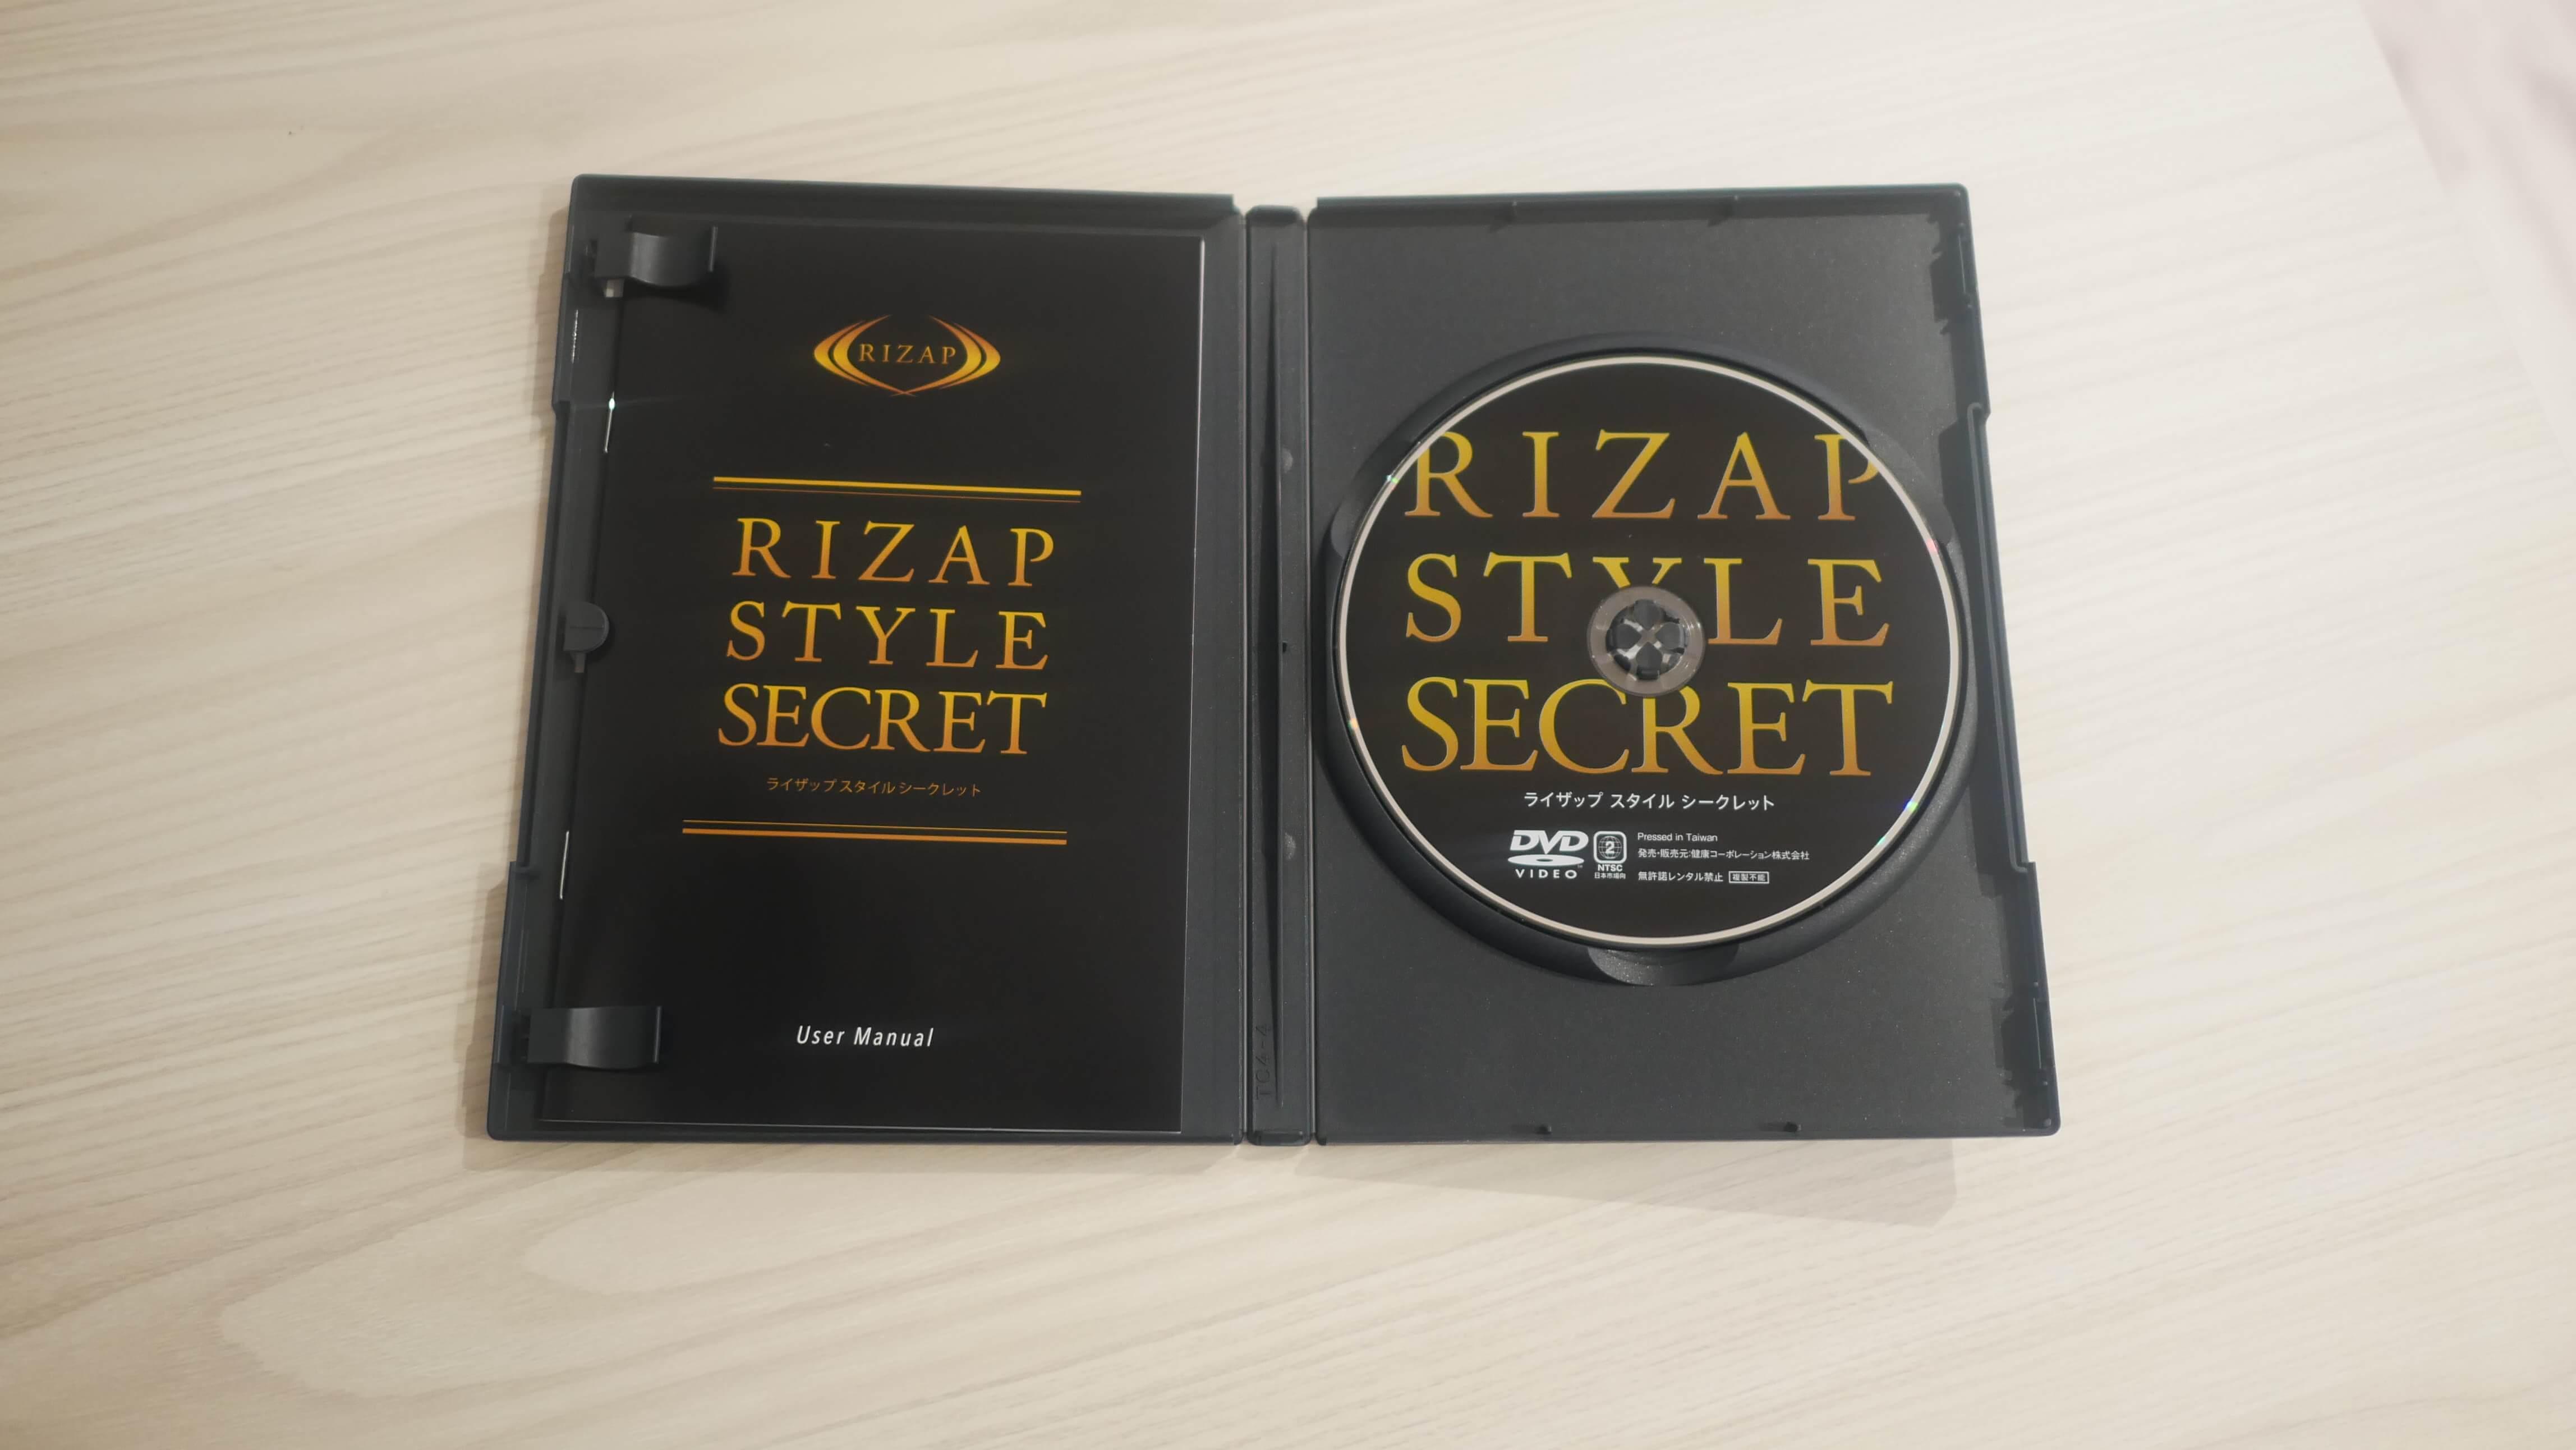 RIZAPSTYLE SECRETDVD(単品価格14,800円)